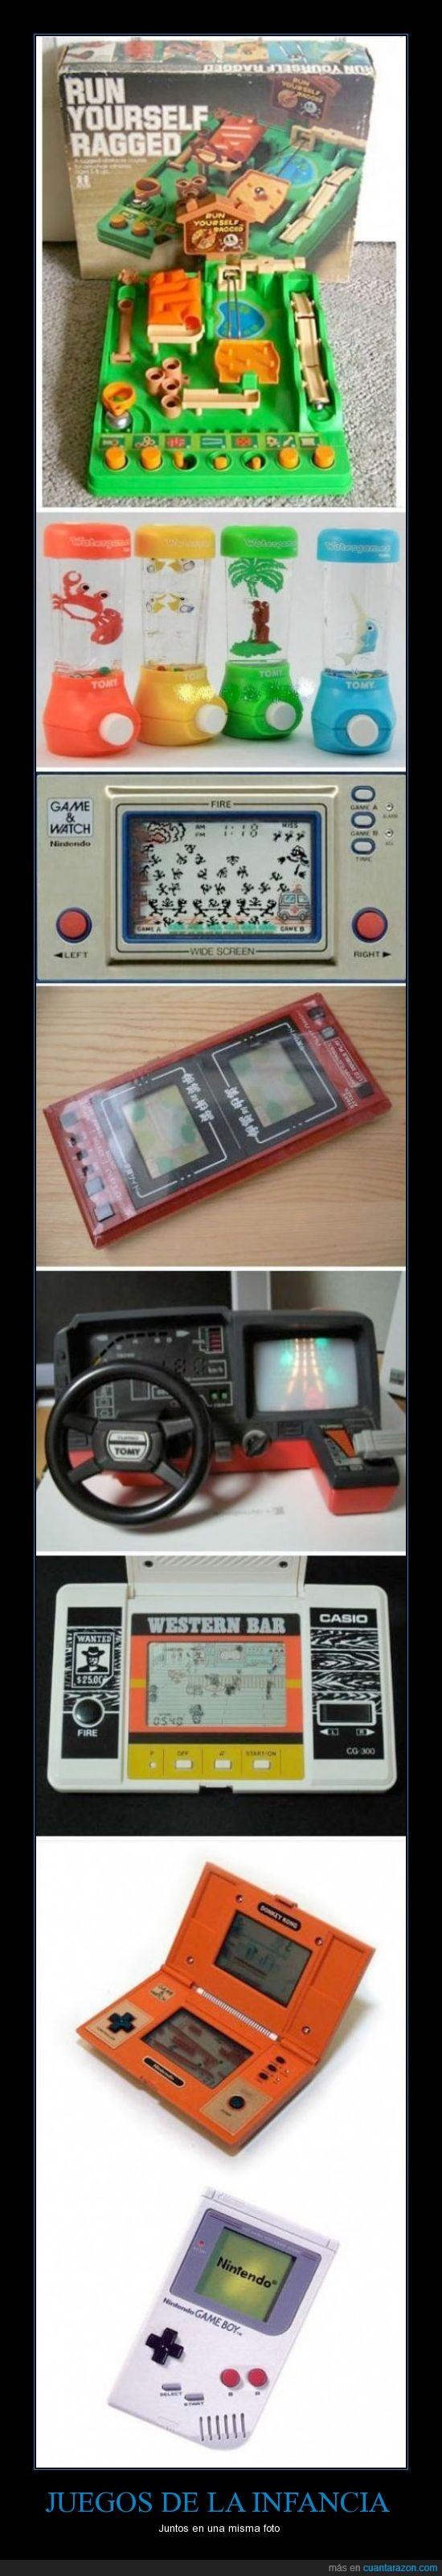 game&watch,gameboy,infancia,juegos,nostalgia,recuerdos